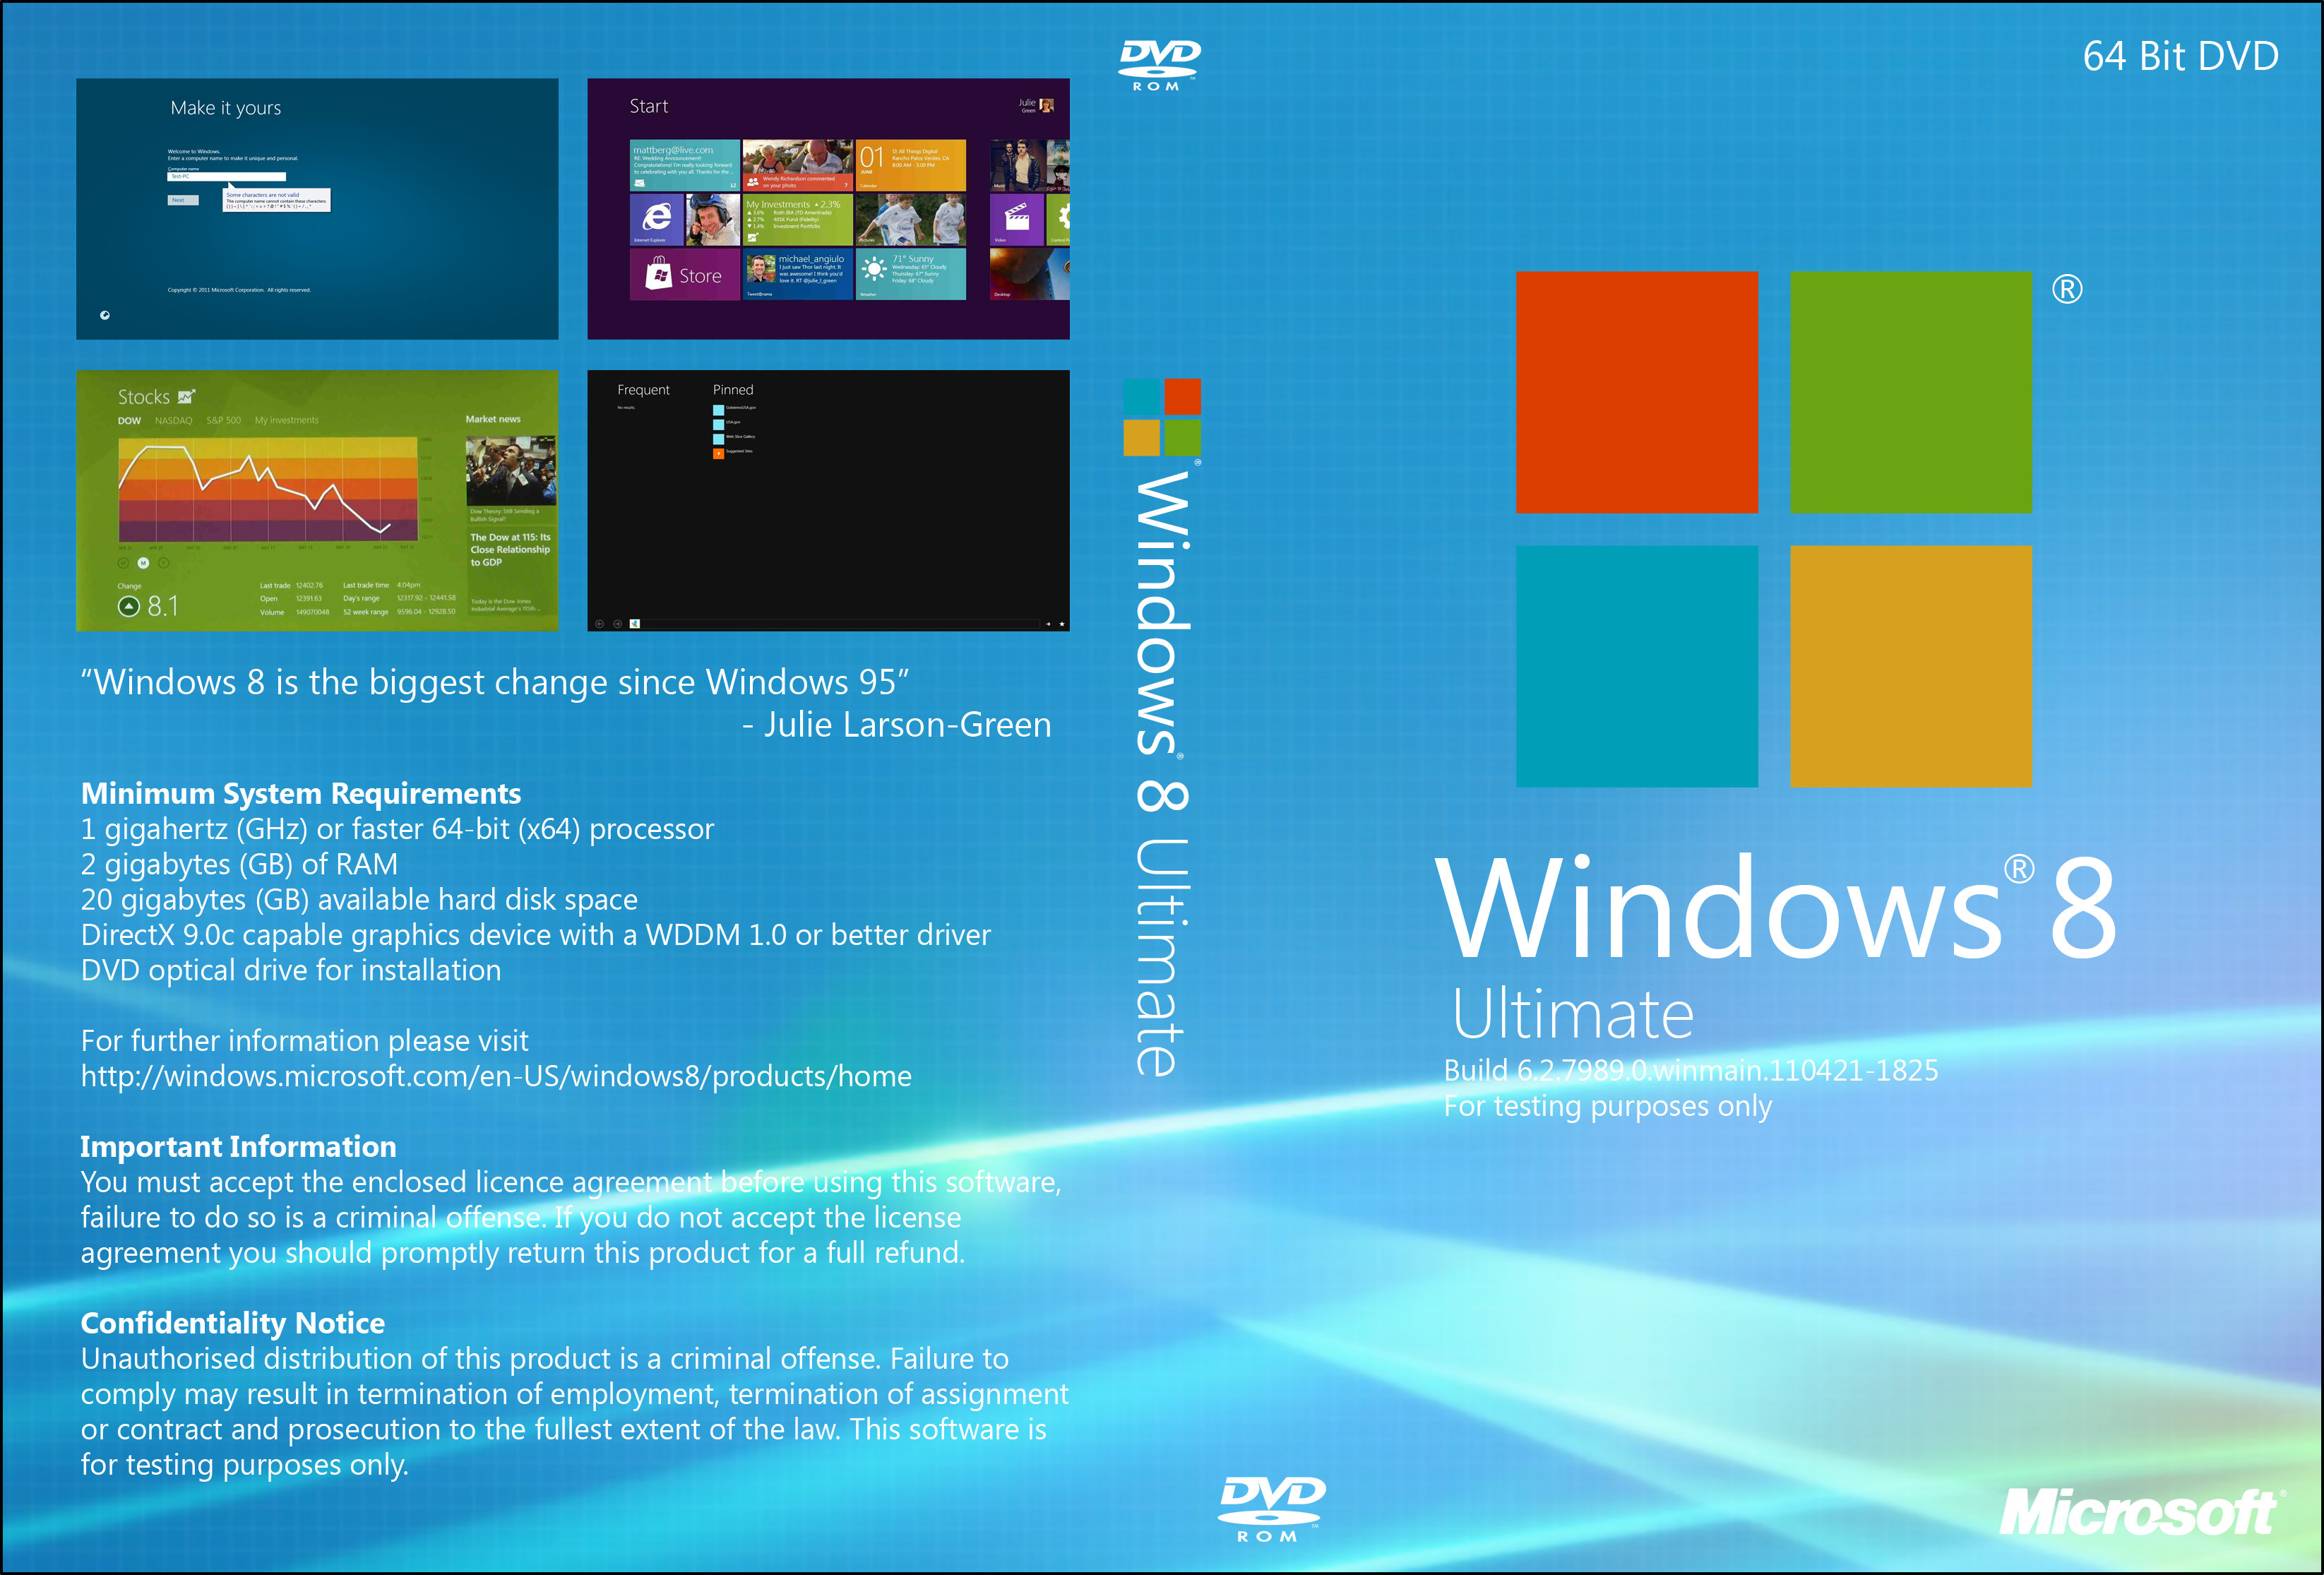 buy windows 8 dvd